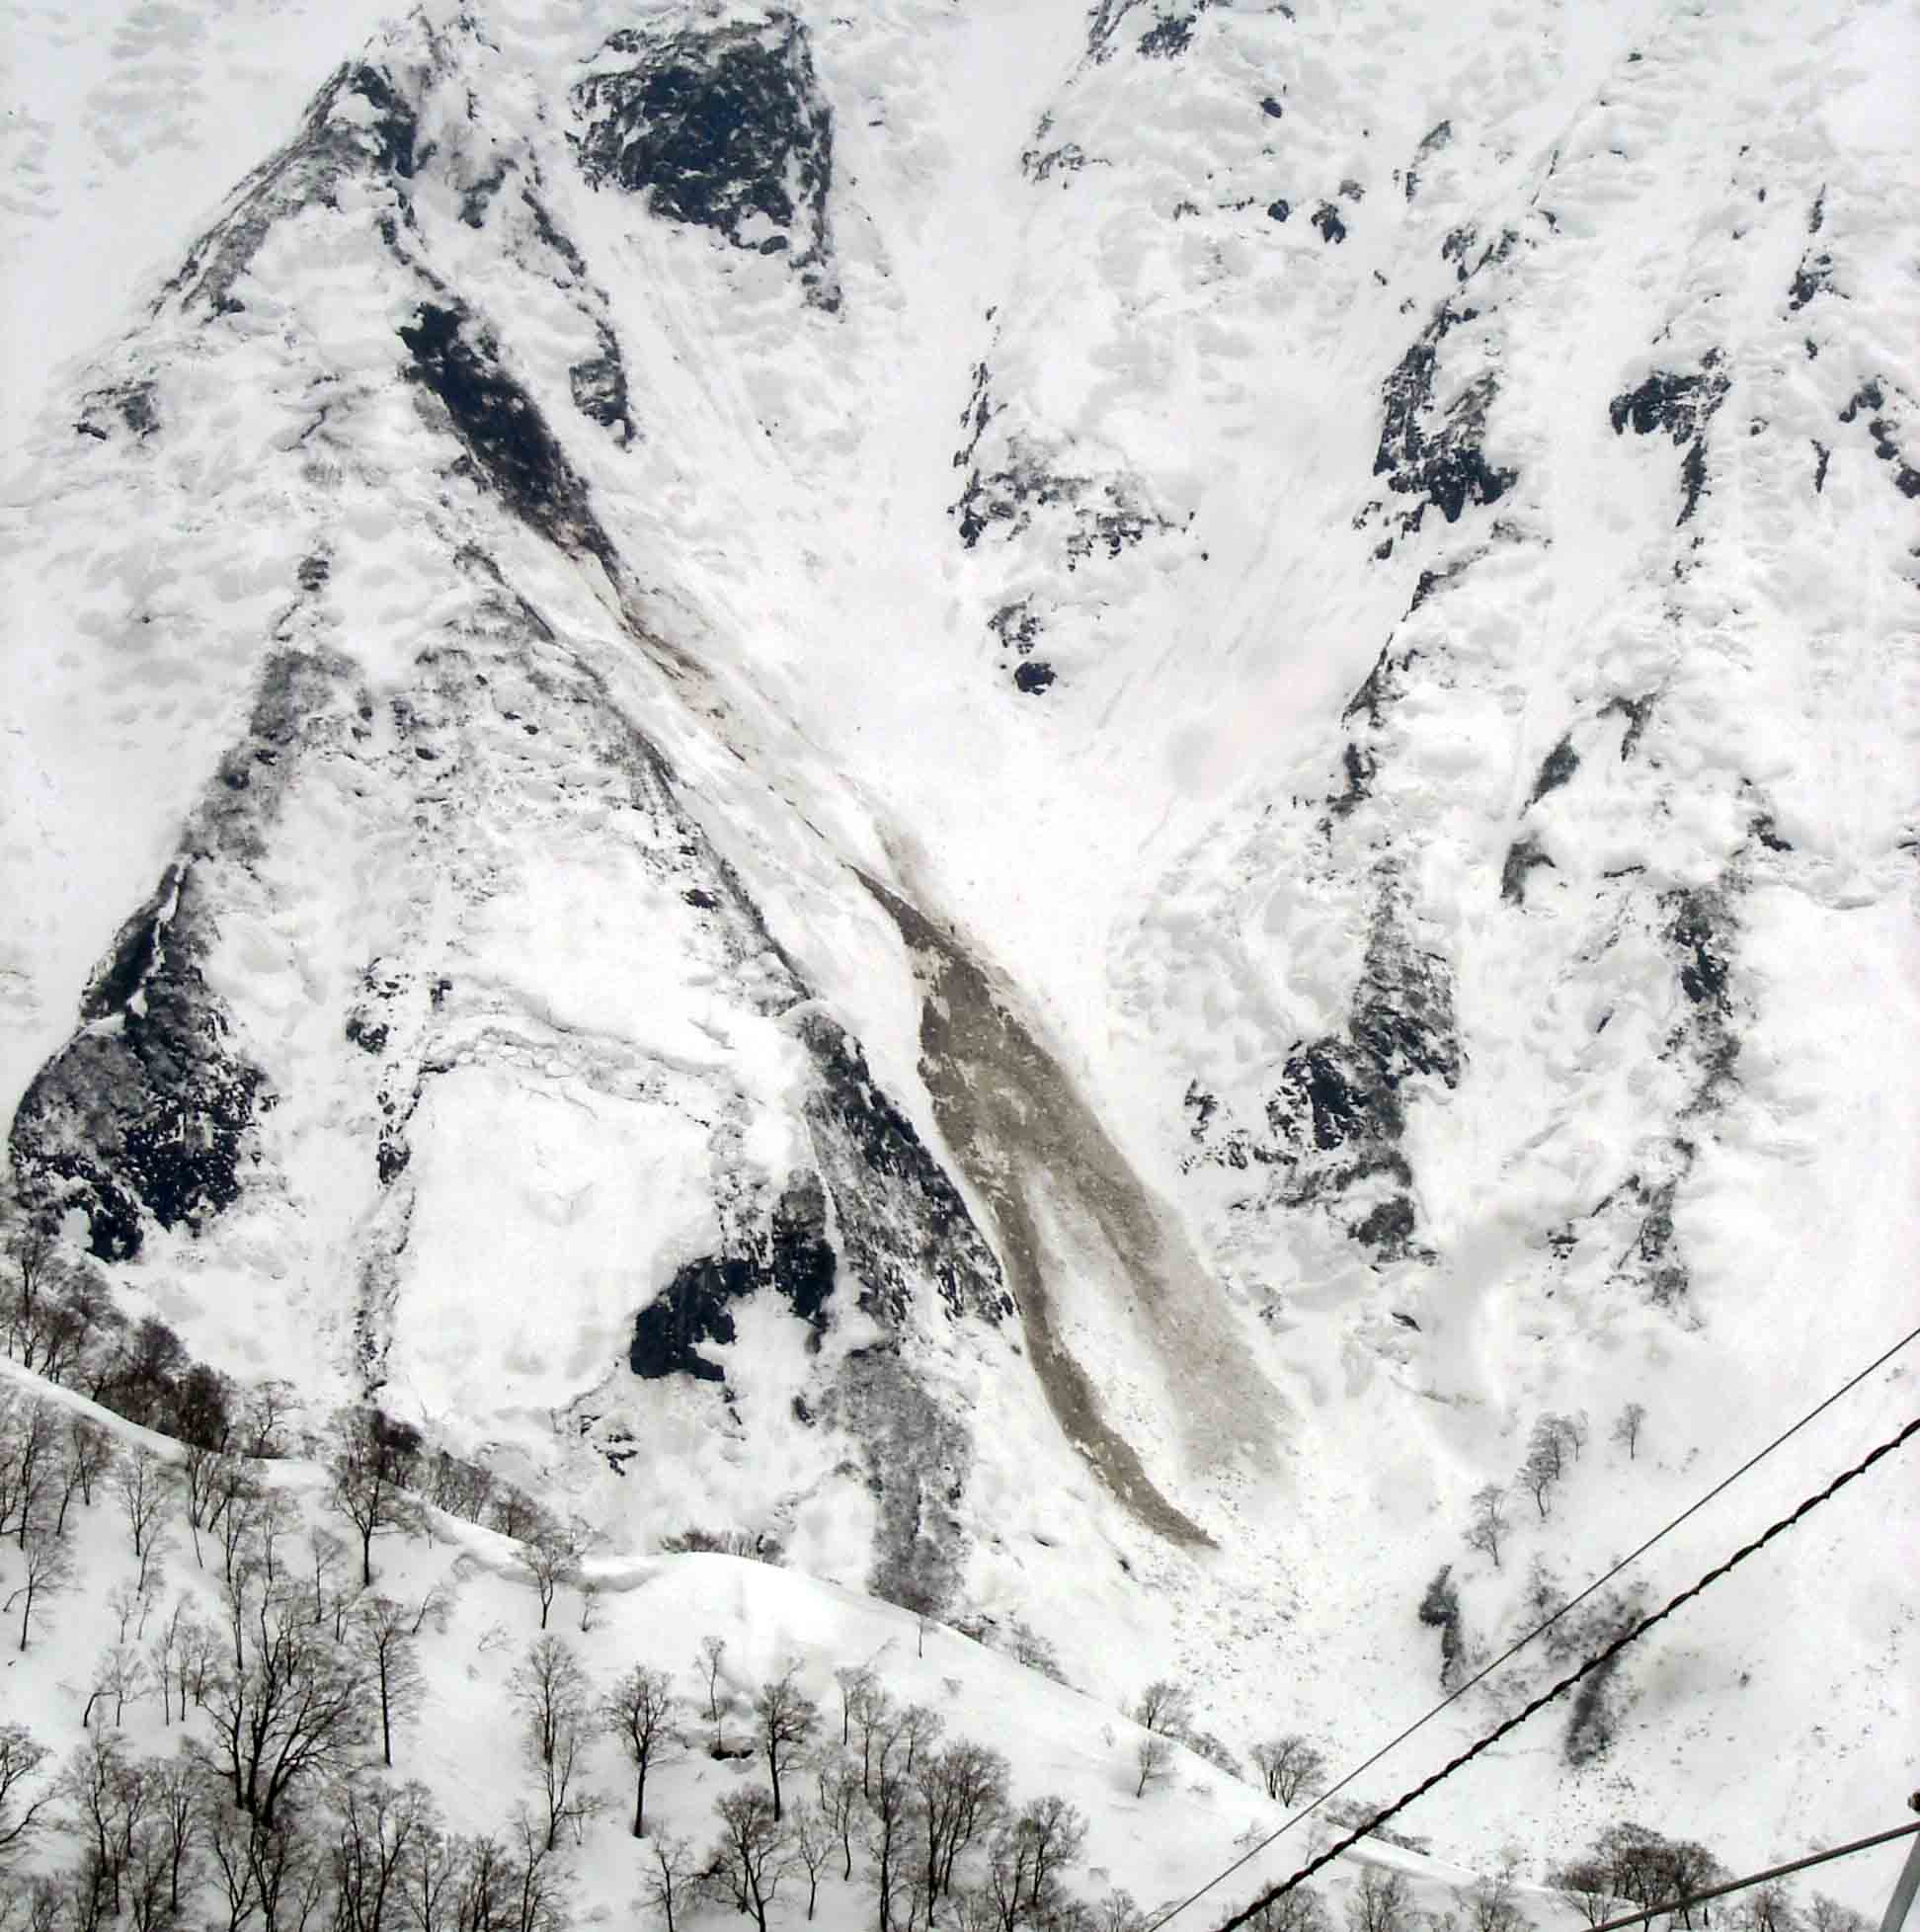 Dsc00361 谷川岳斜面の全層雪崩跡